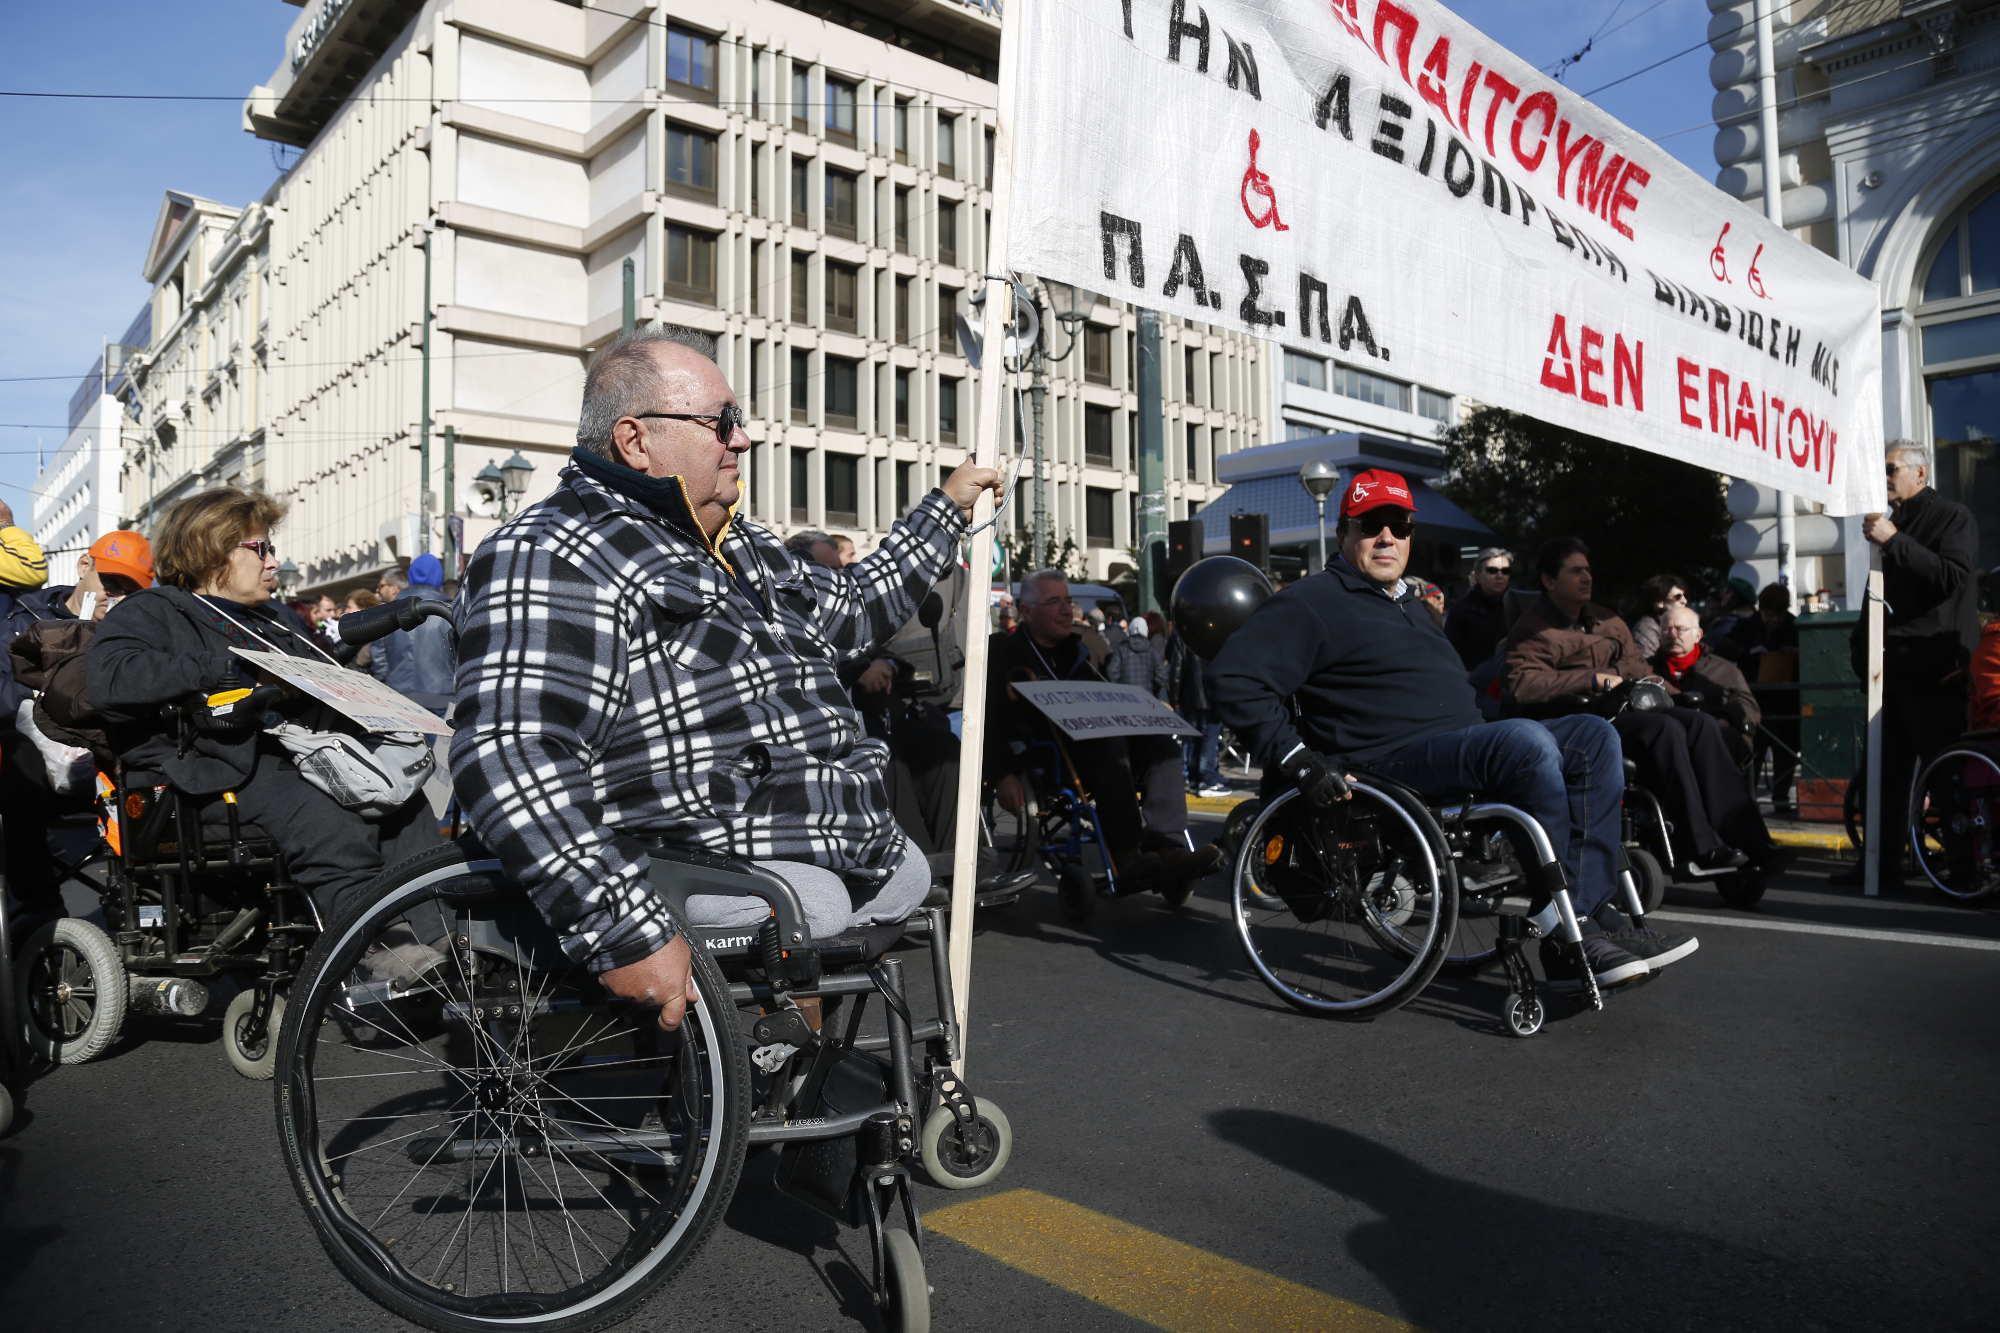 amea-diamartyria-1300 Στους δρόμους τα ΑΜΕΑ - «Θέλουμε να ζήσουμε αξιοπρεπώς»